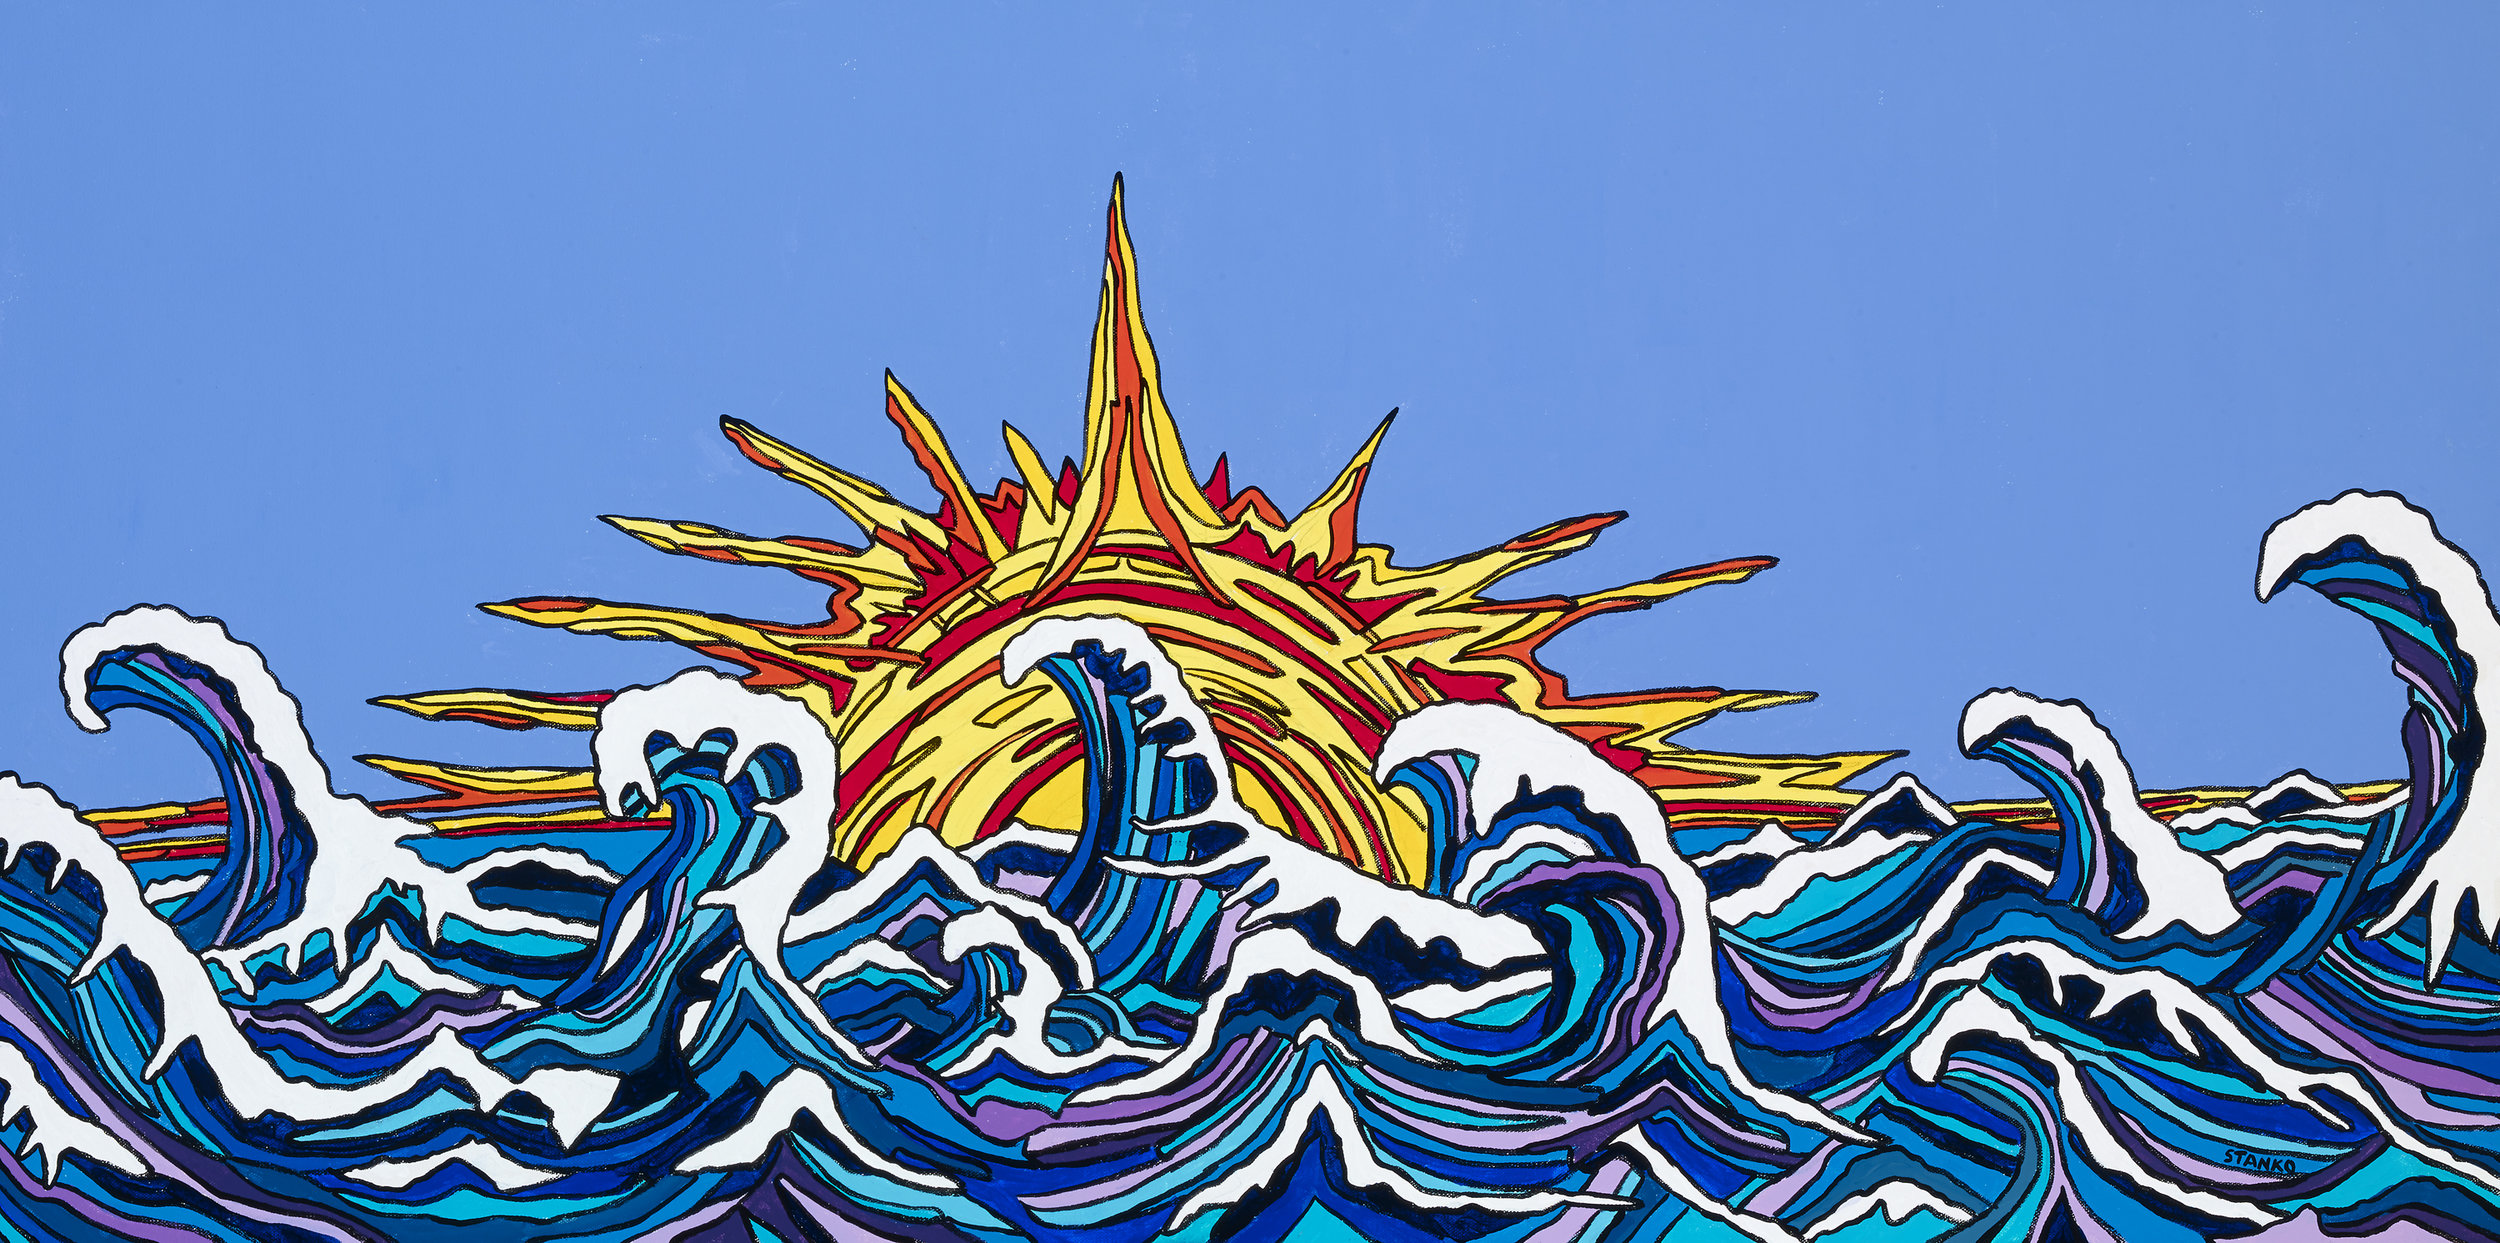 Mike Stanko-The Waving Sun-Acrylic-$800